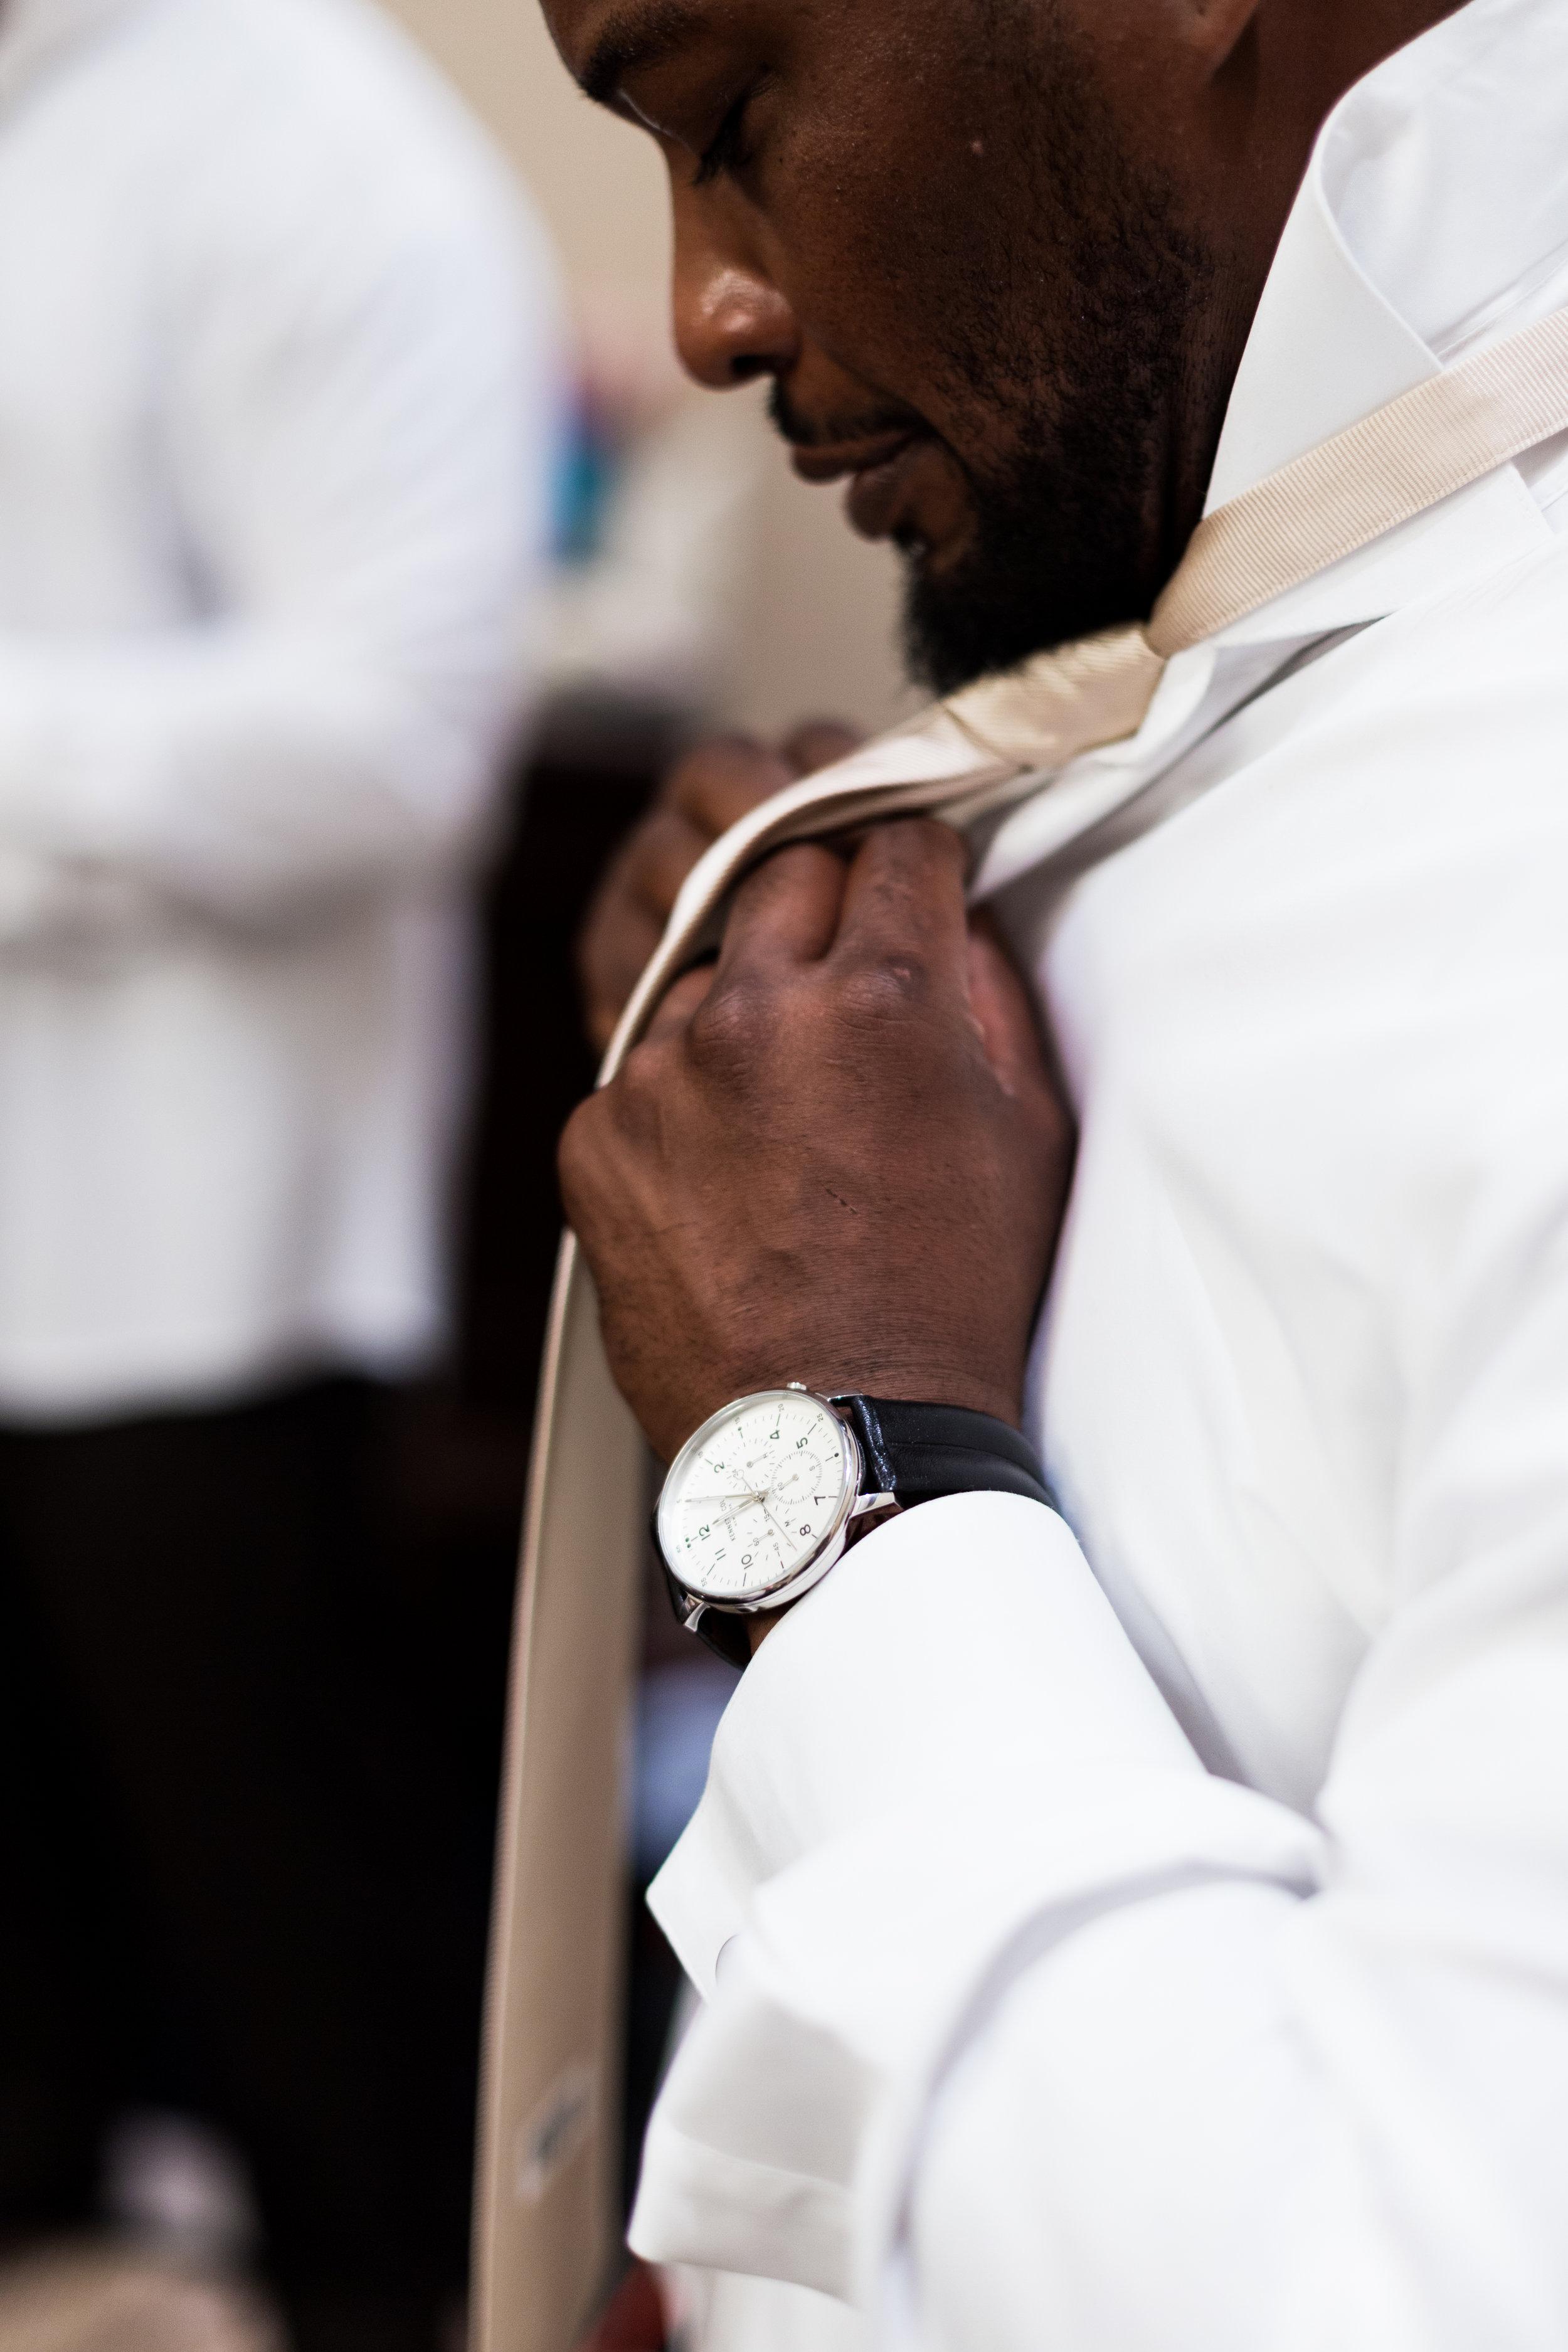 st-louis-wedding-photographer-third-baptist-church-54.jpg